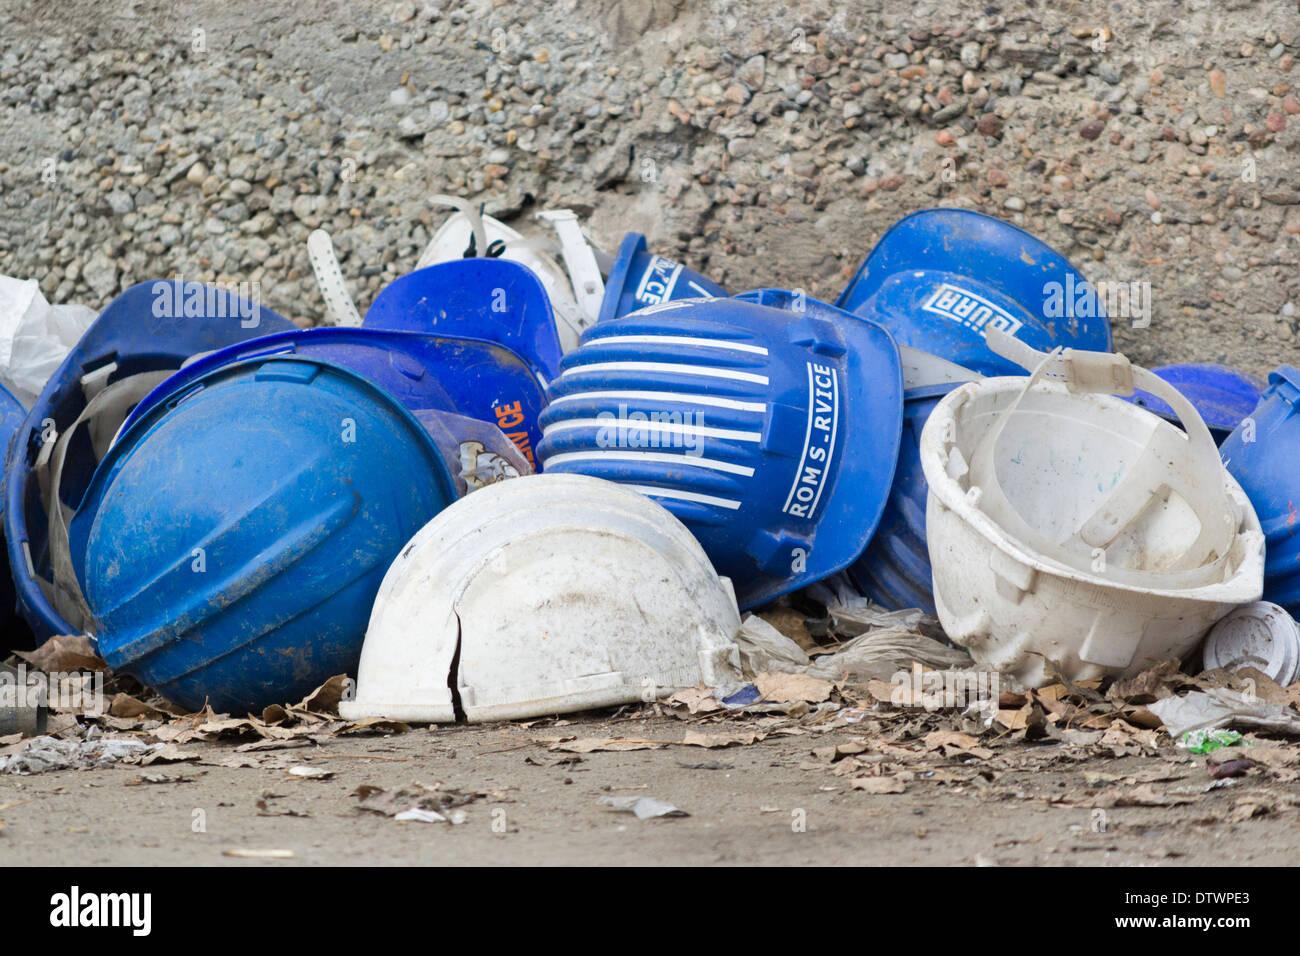 used-blue-helmets-DTWPE3.jpg